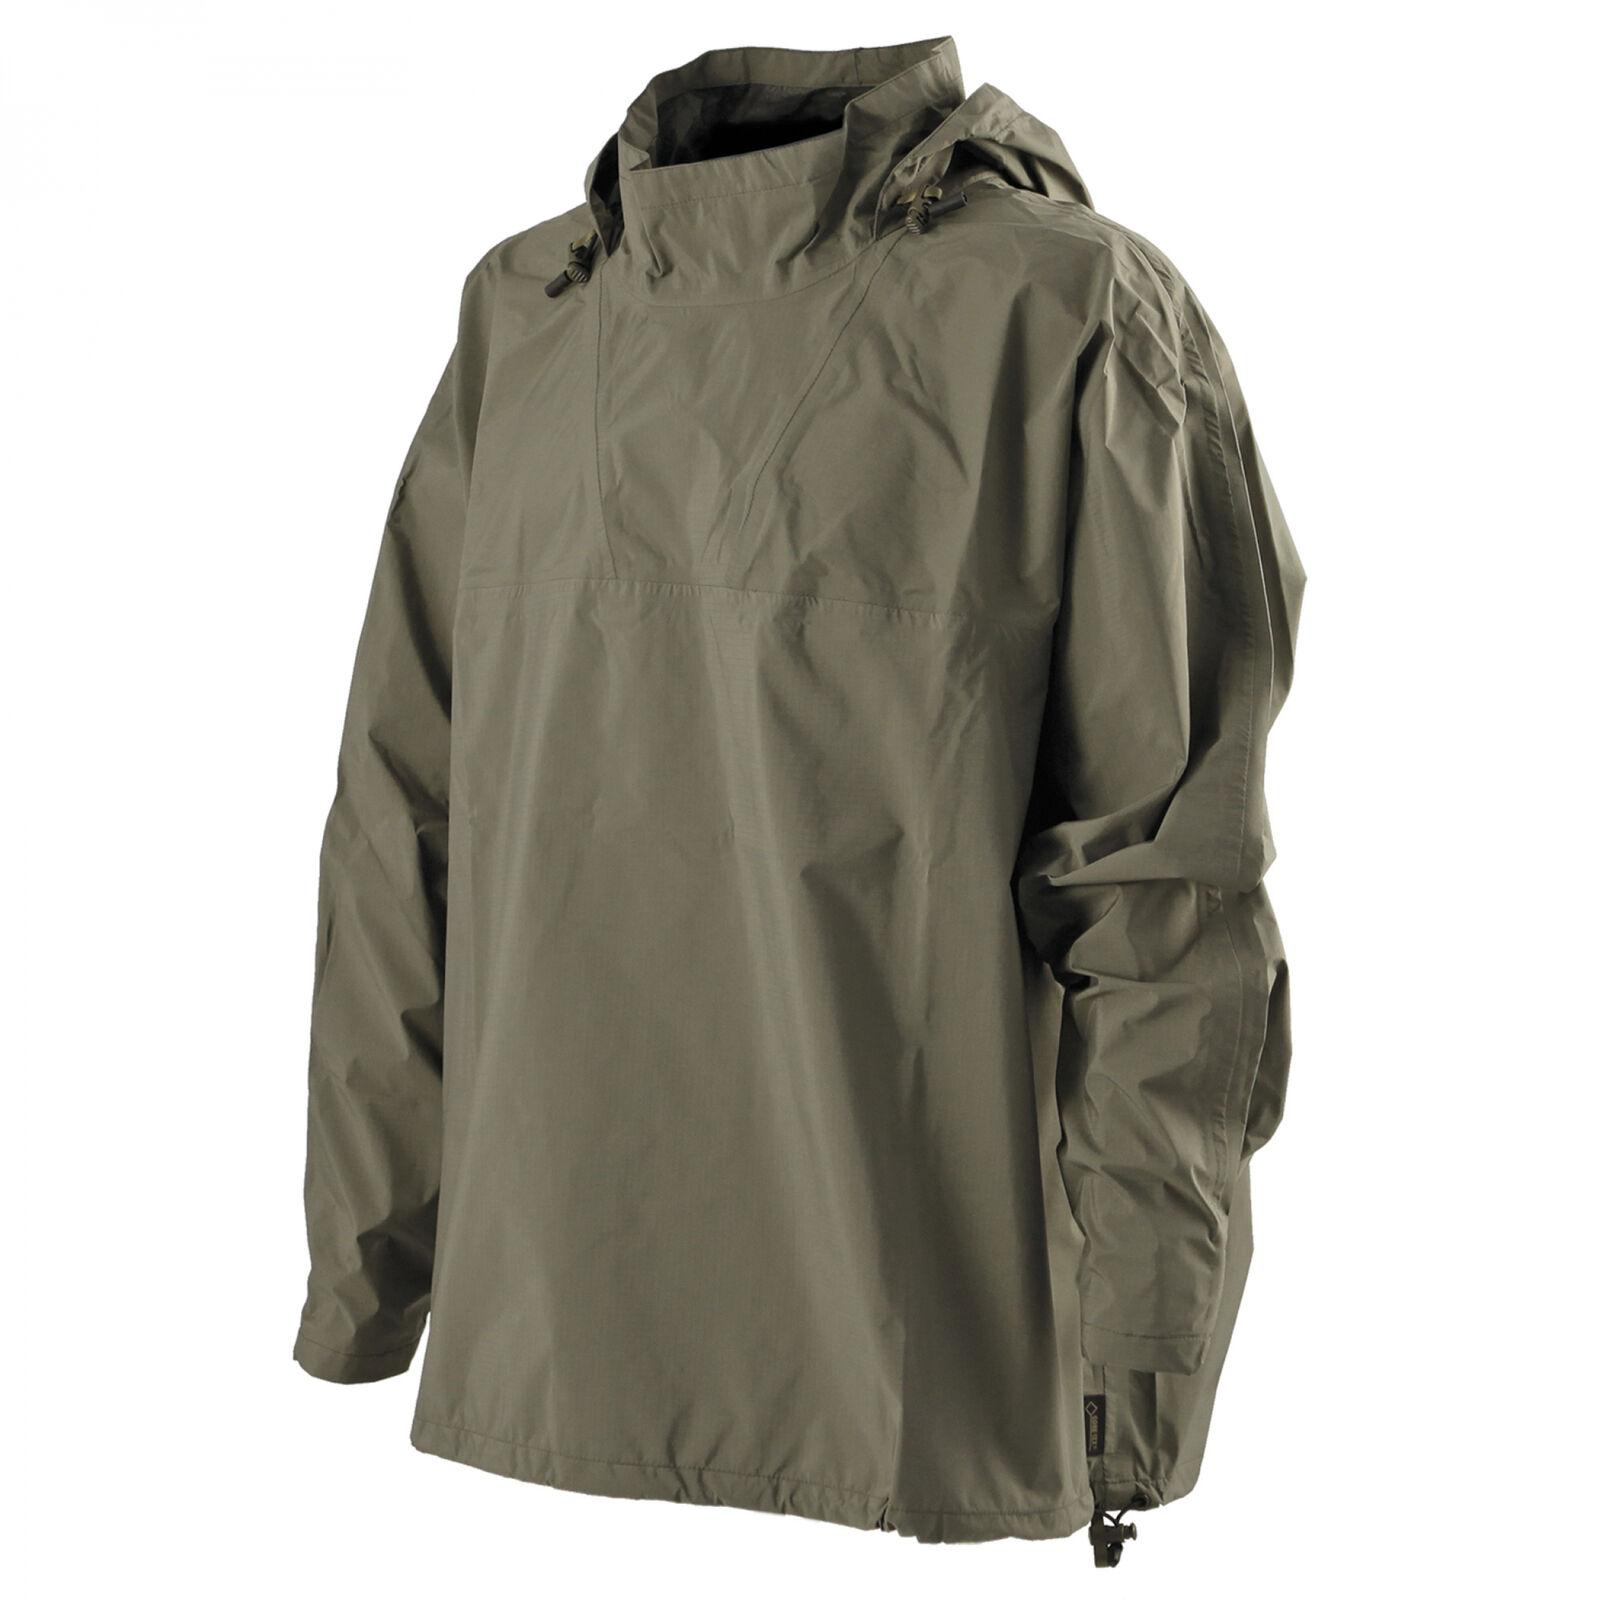 Cocheintia survival rainsuite chaqueta verde oliva  lluvia chaqueta goretex  bienvenido a comprar